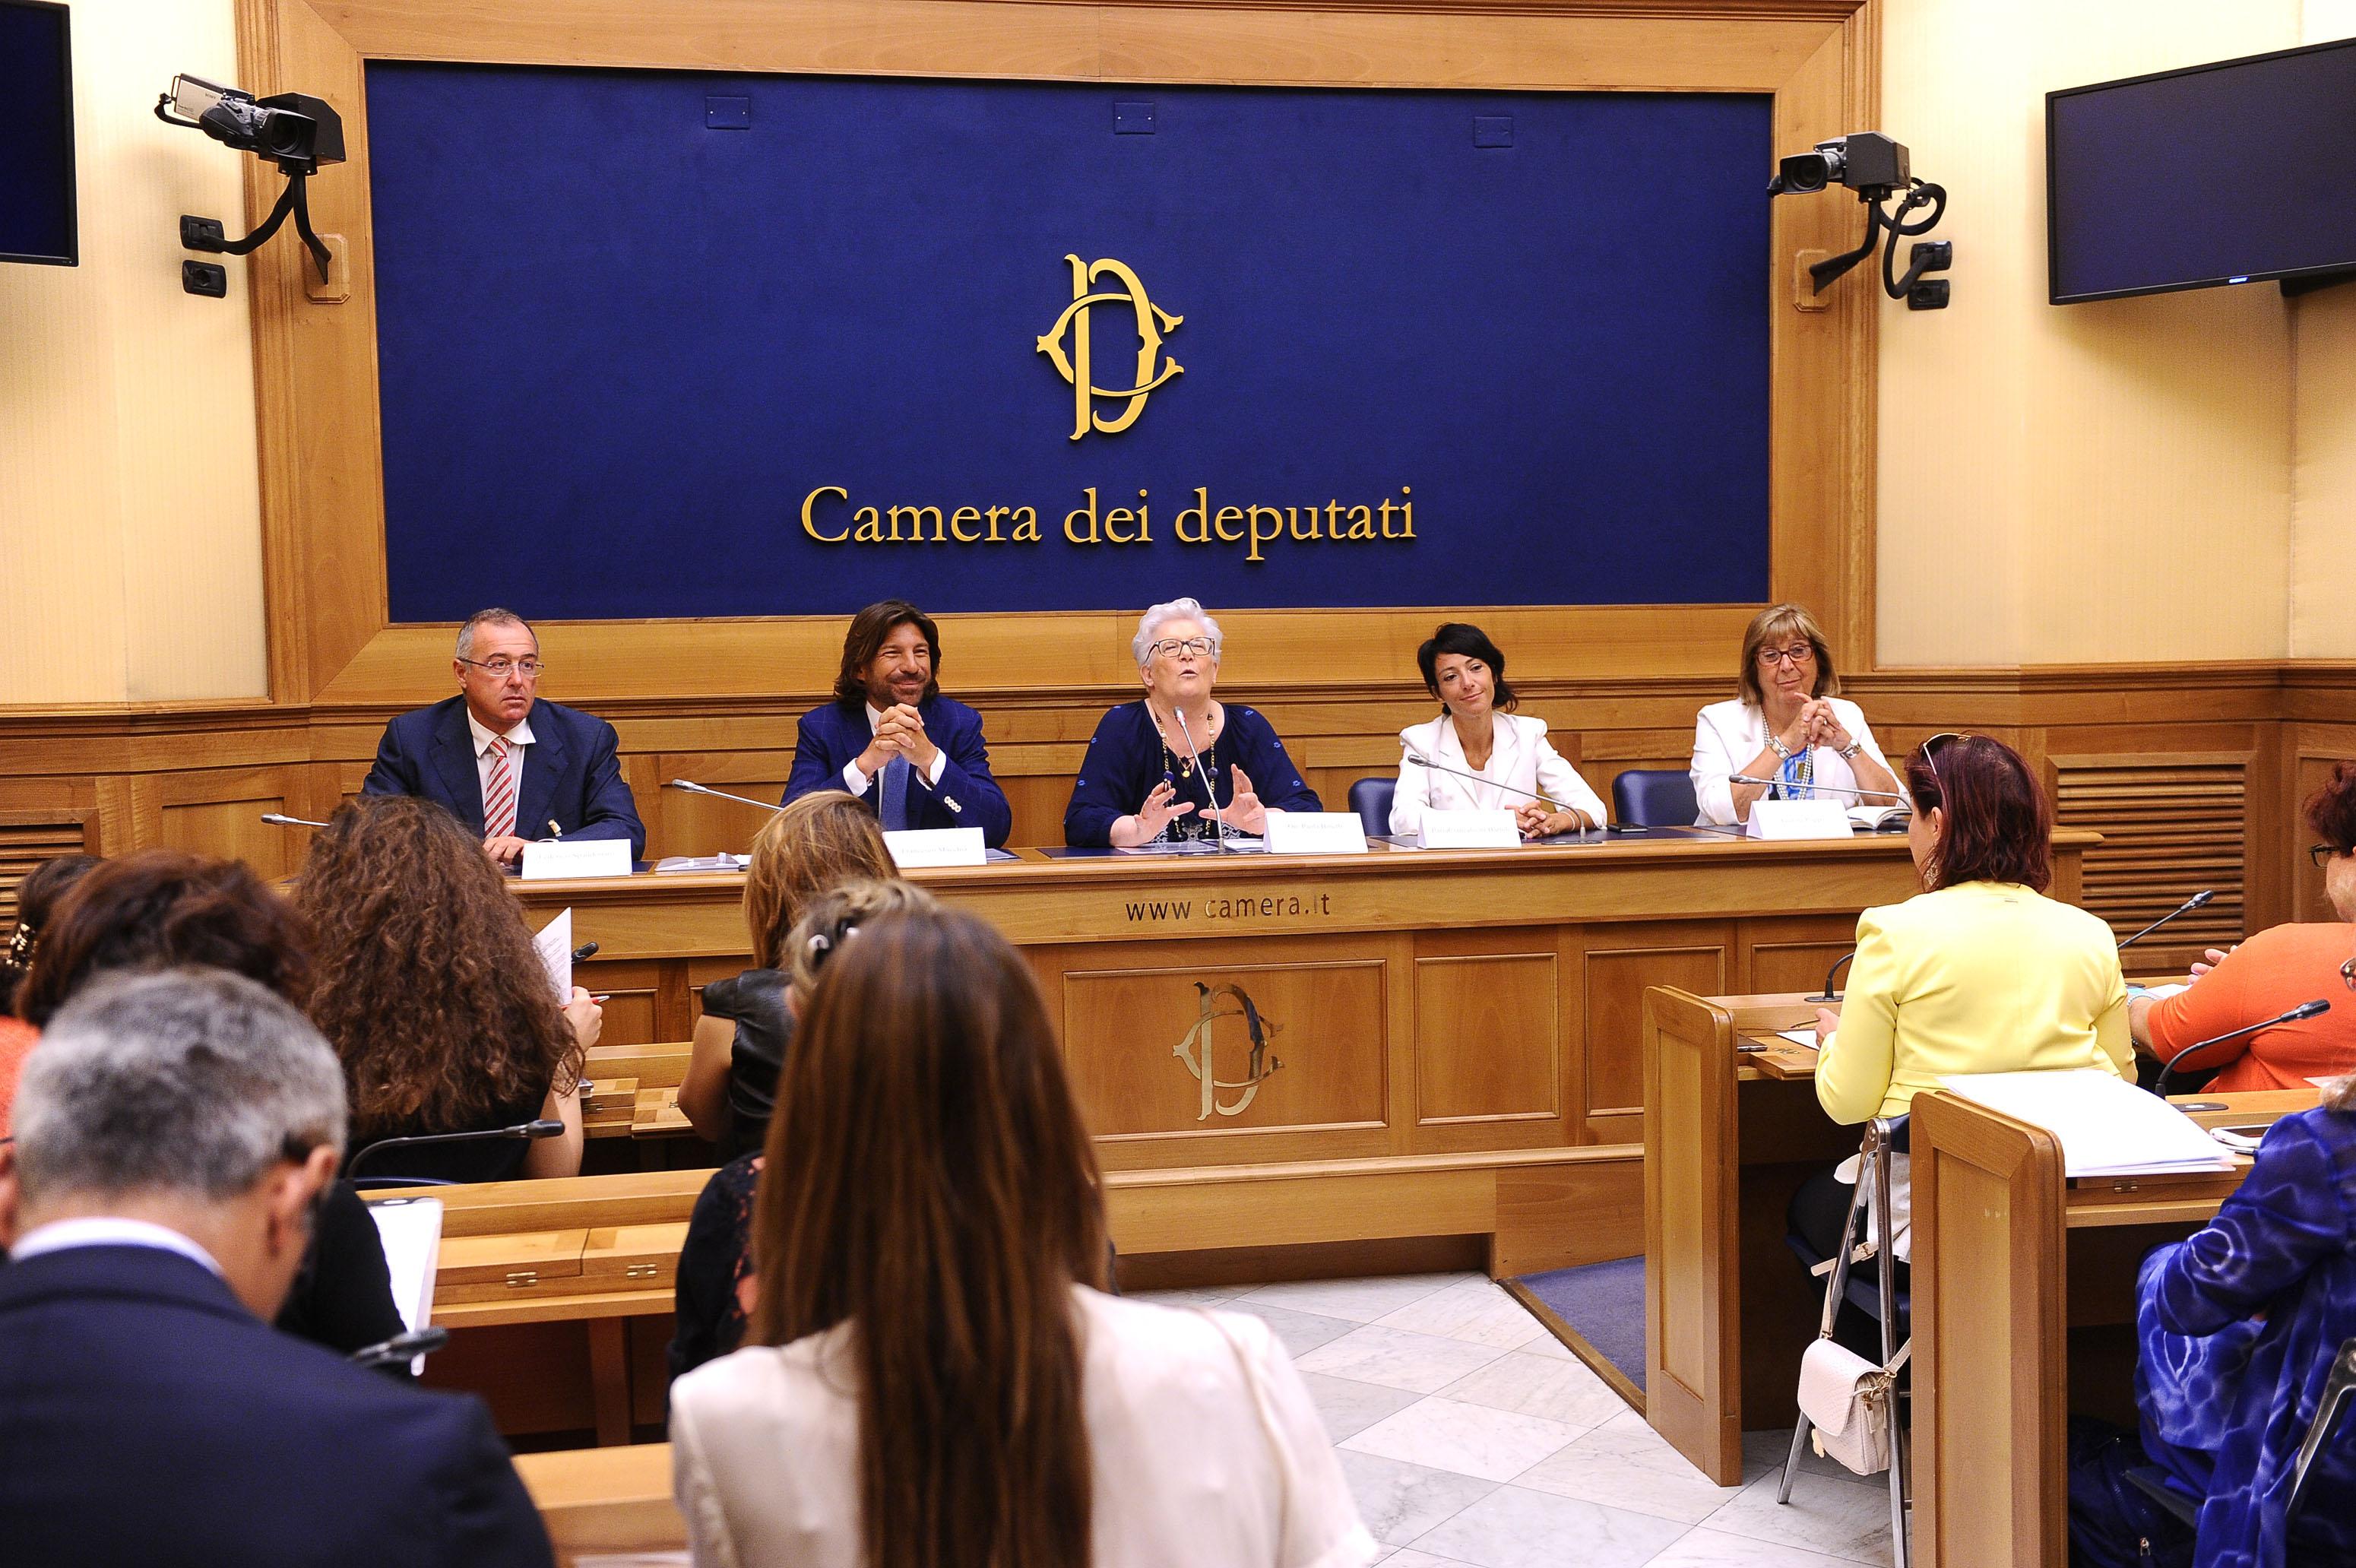 Le associazioni dei pazienti insieme a parlamentari e for Camera dei deputati italiana